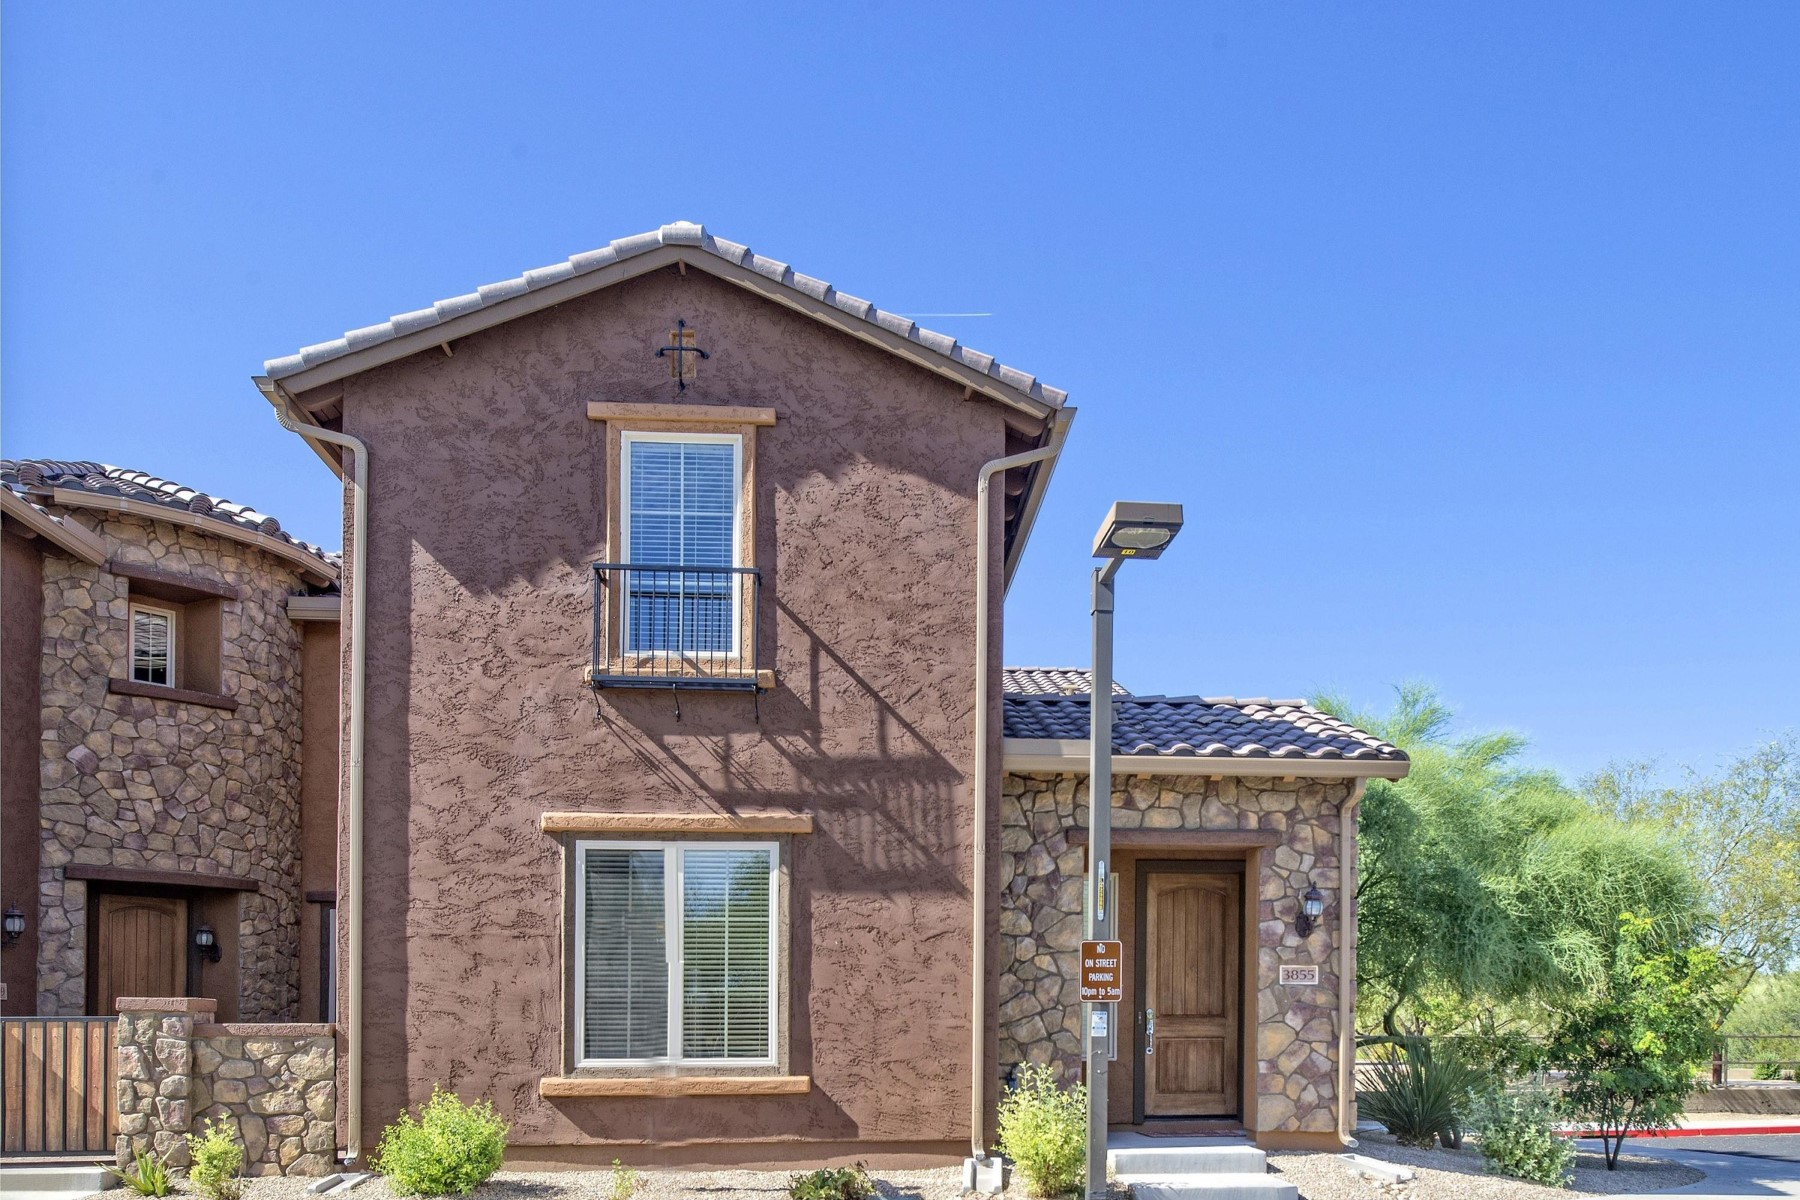 Townhouse for Sale at Beautiful Bora model townhome in Desert Ridge 3855 E Cat Balue Dr Phoenix, Arizona, 85050 United States